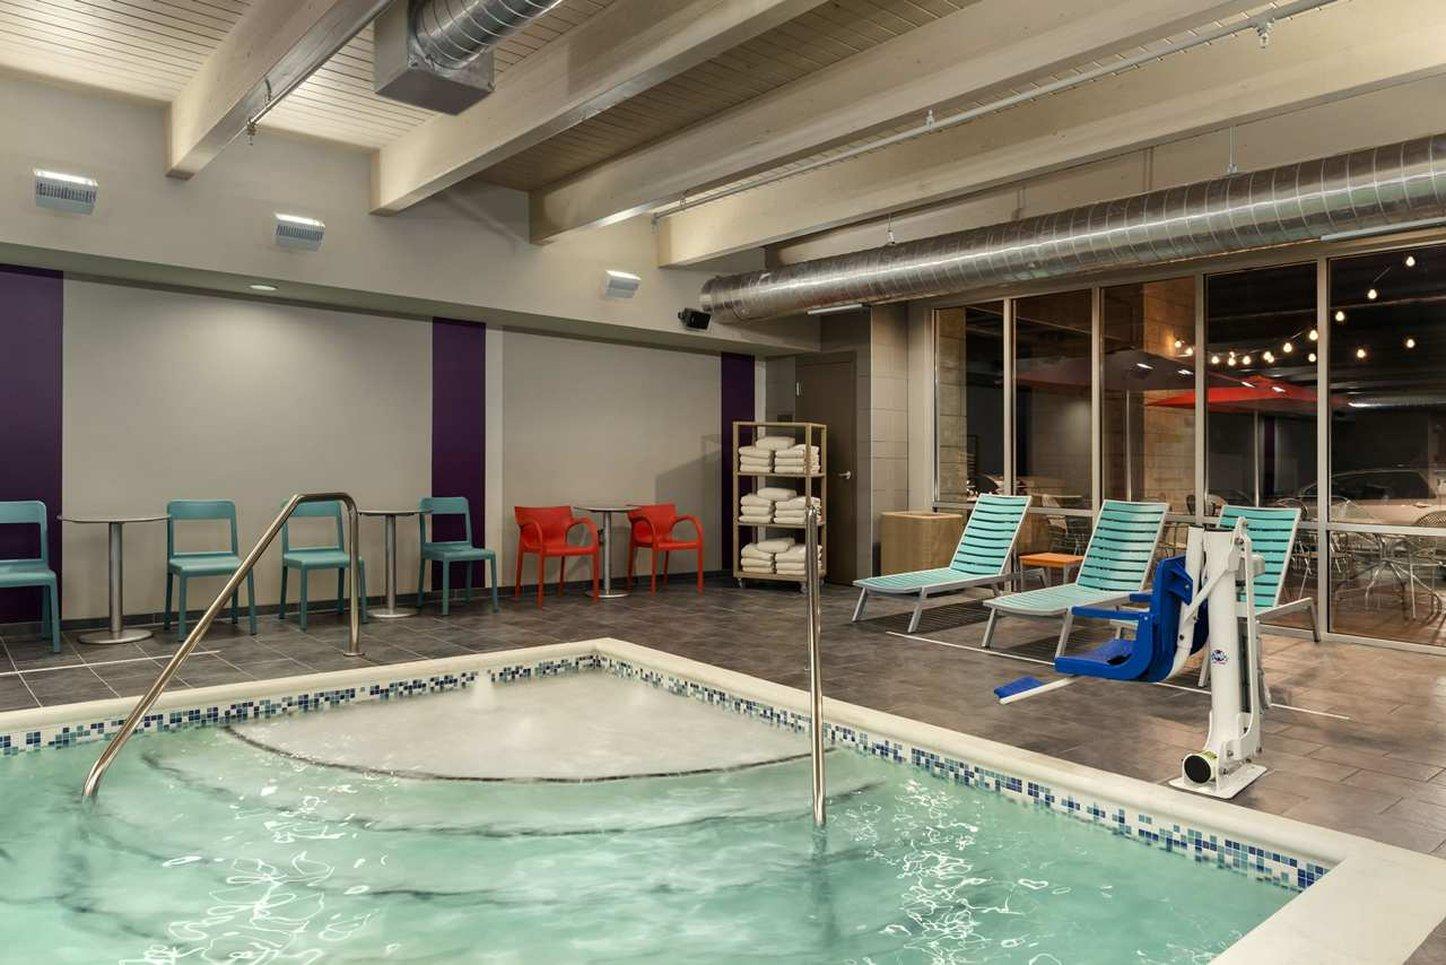 cazare la Home2 Suites By Hilton Charlotte I-77 South, Nc